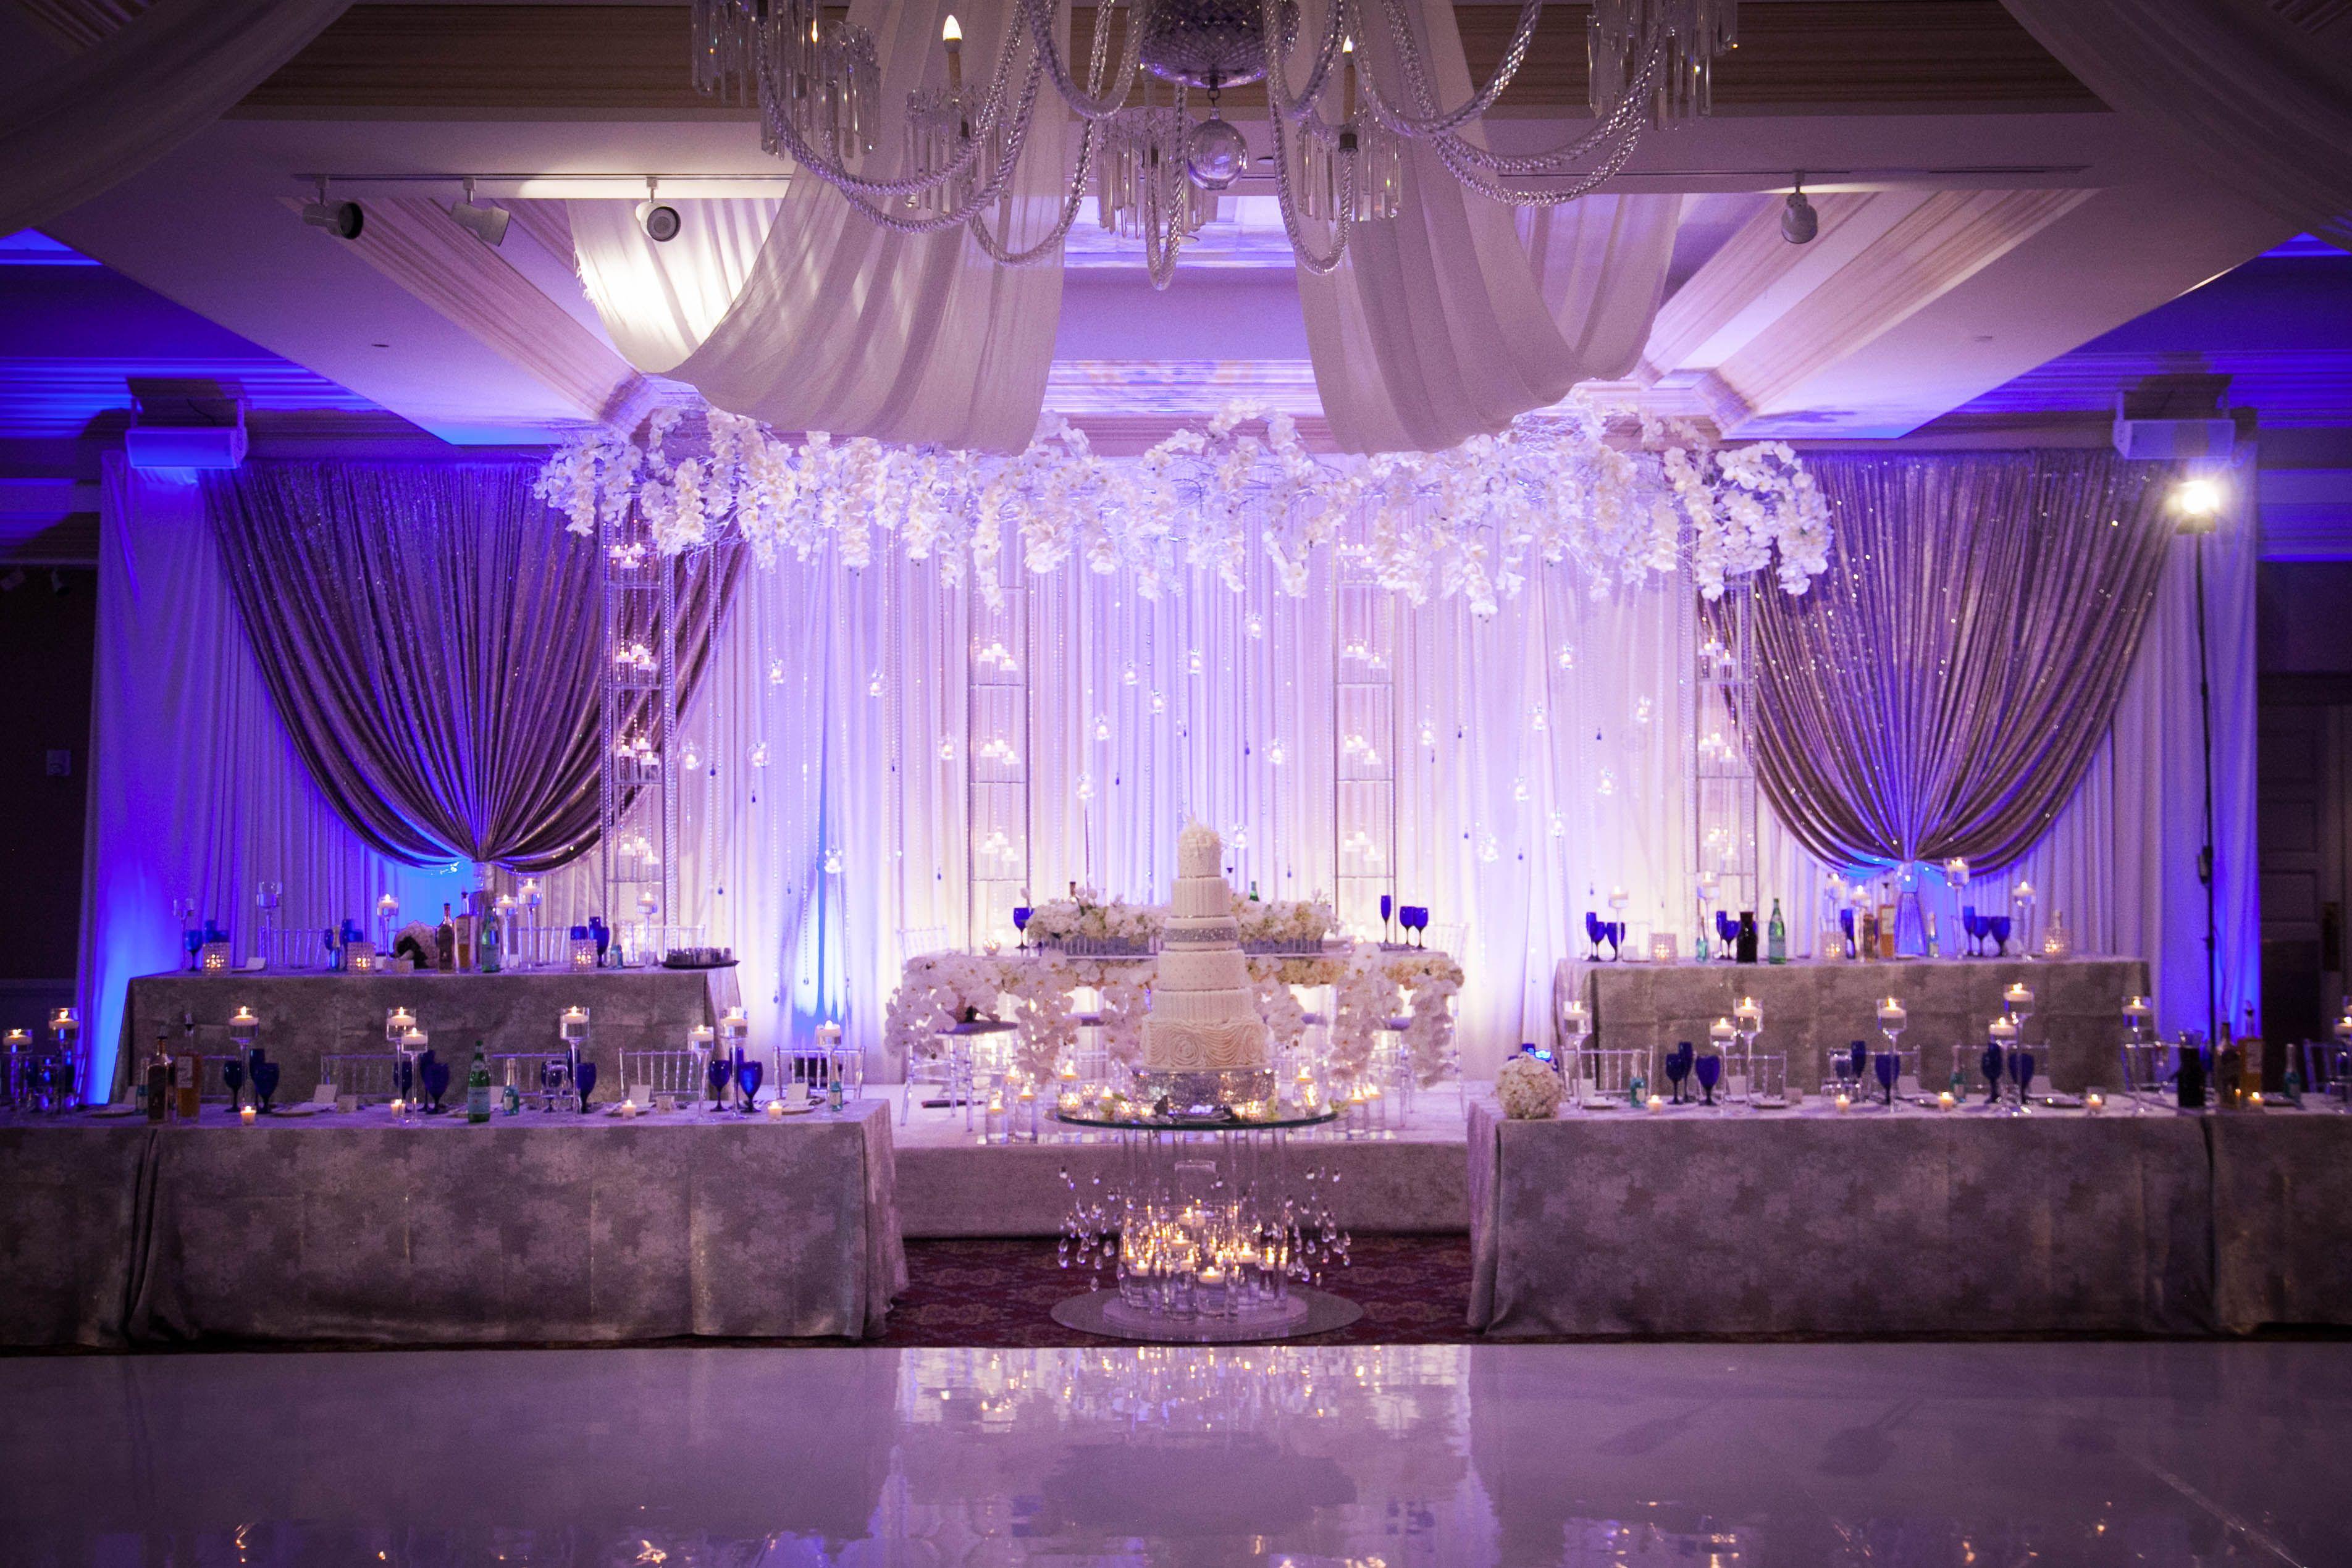 Bridal Party Stage Decor By Yanni Design Studio Wedding Decorations Stage Decorations Stage Backdrop